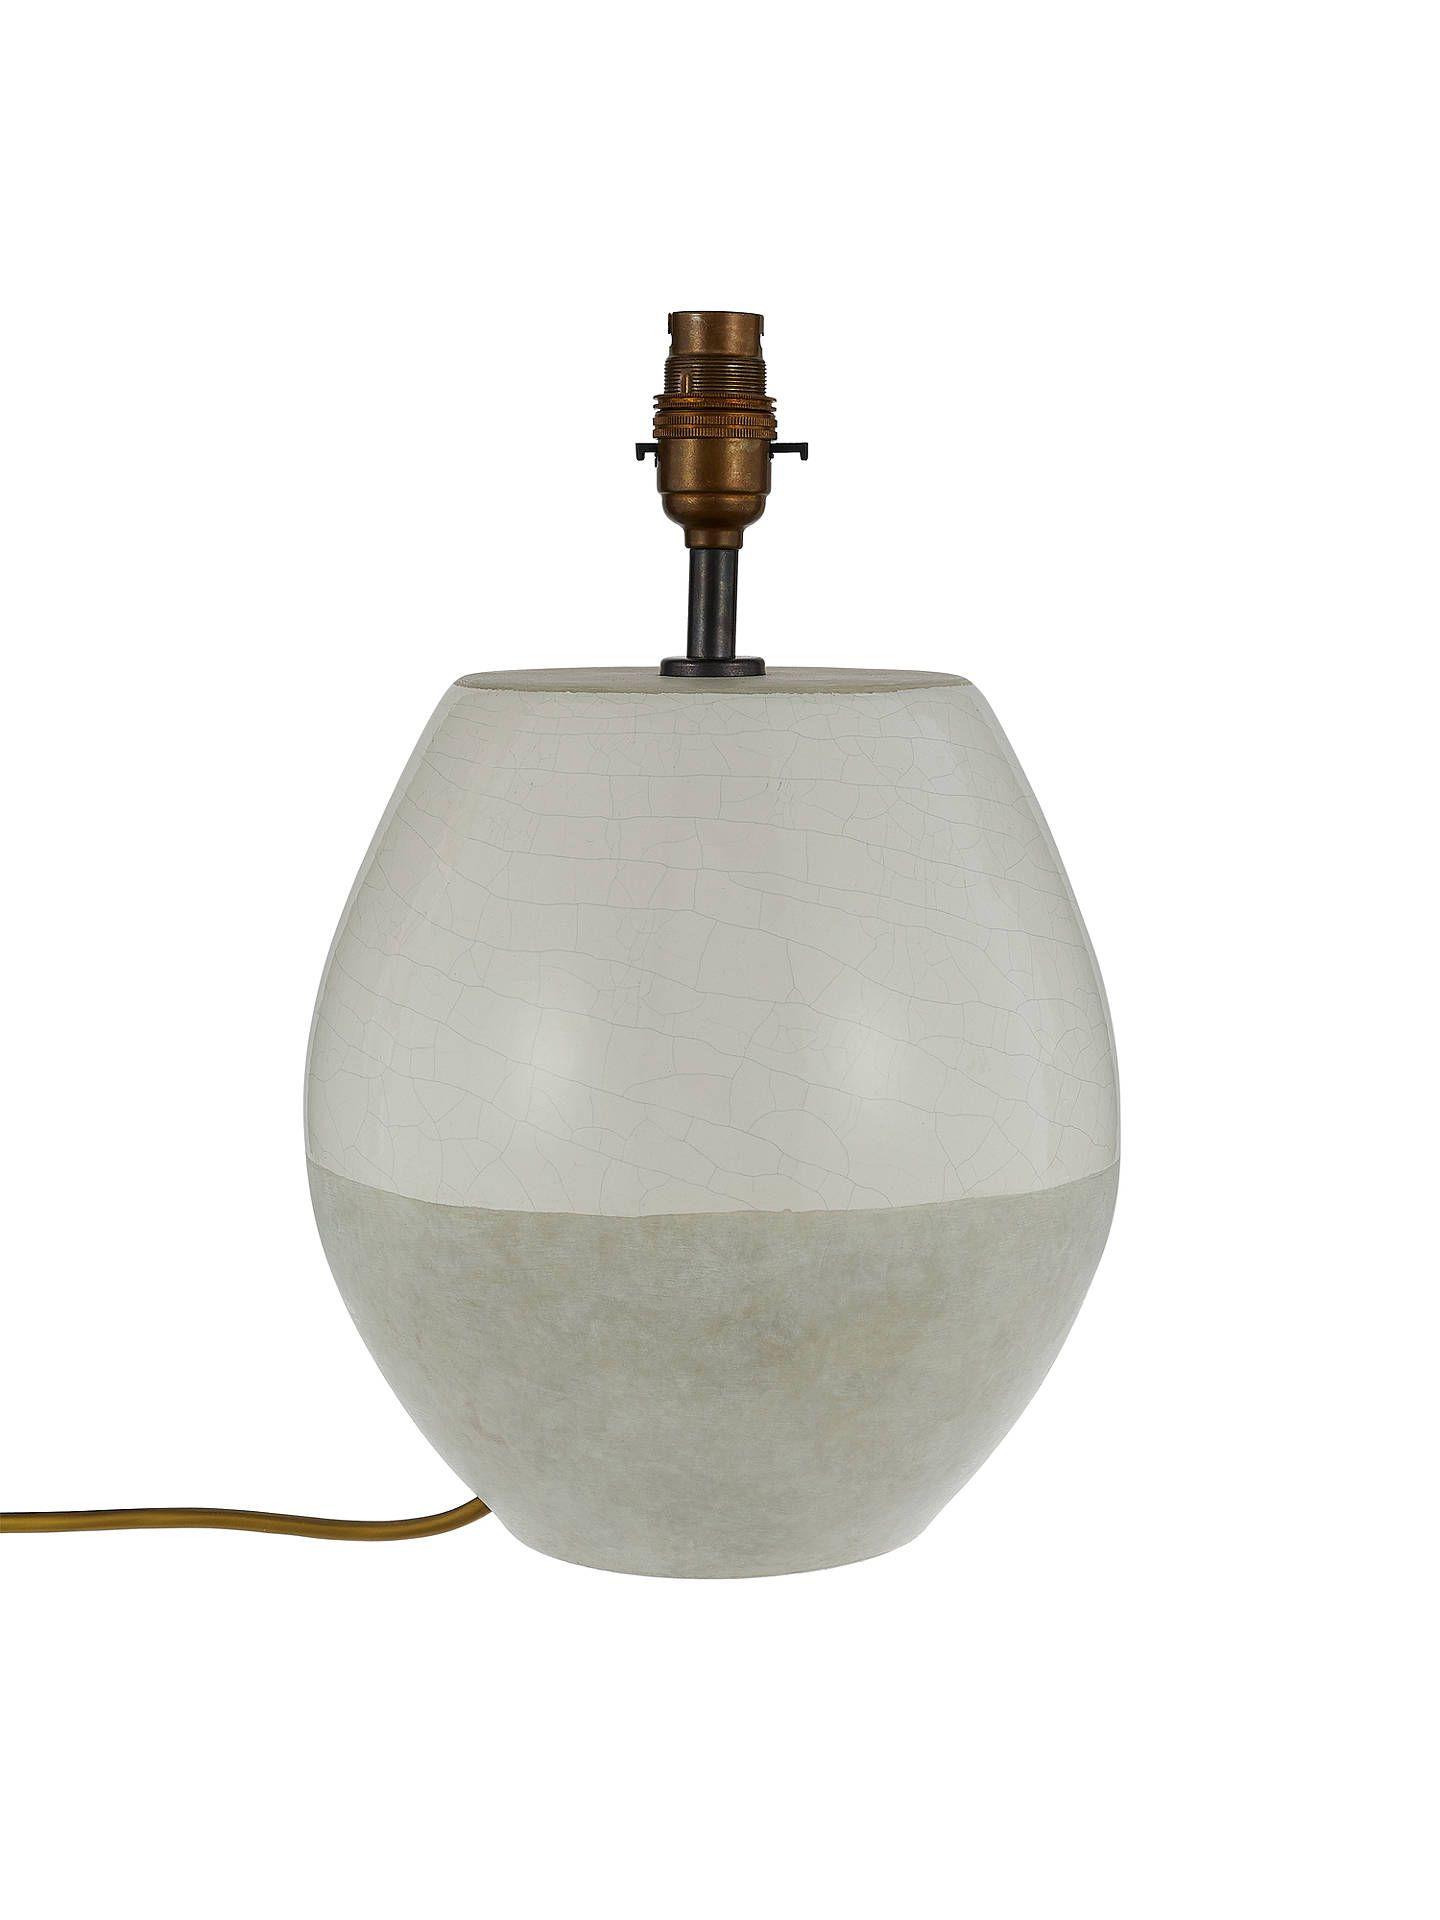 Croft Collection Piper Ceramic Lamp Base, Light Grey